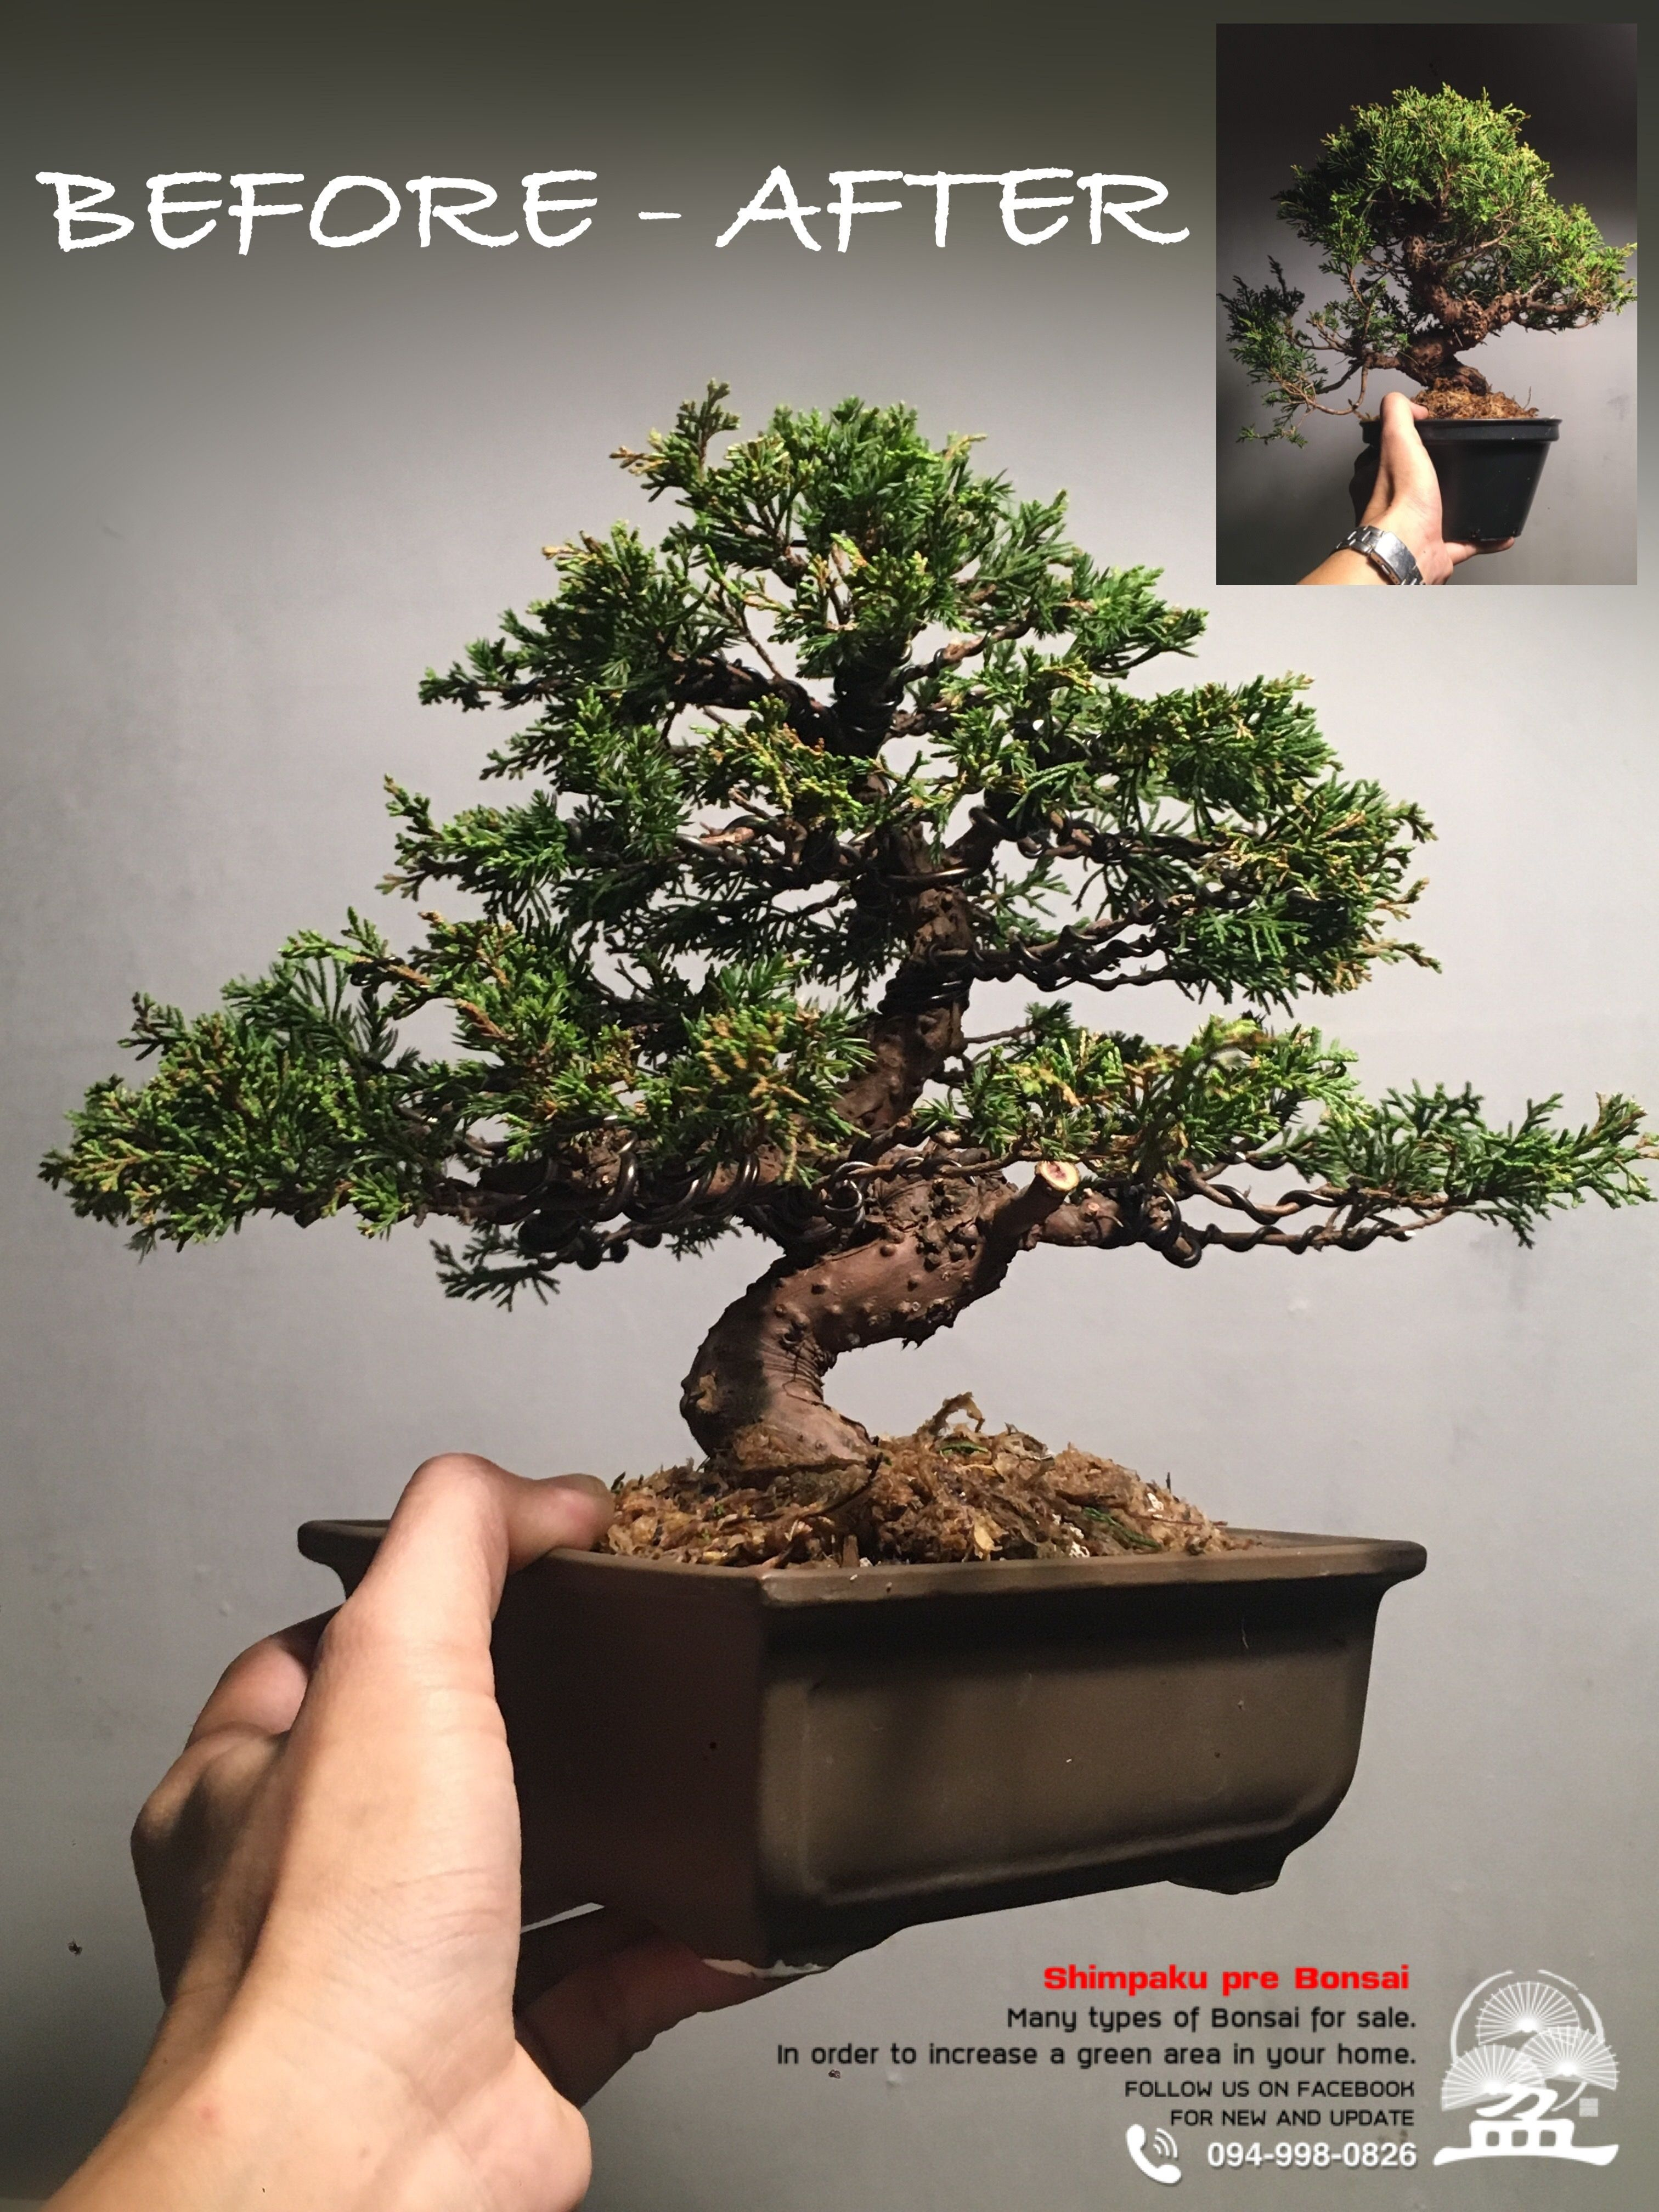 "Itoigawa Shimpaku À¸šà¸à¸™à¹""ซ À¸ªà¸™à¸Š À¸¡à¸›à¸²à¸ Itoigawashimpaku Shohin Bonsai ǜŸæŸ Ǜ†æ½ ·ンパク ßニ盆栽 Bonsai Tree Price Bonsai Bonsai Trees For Sale"